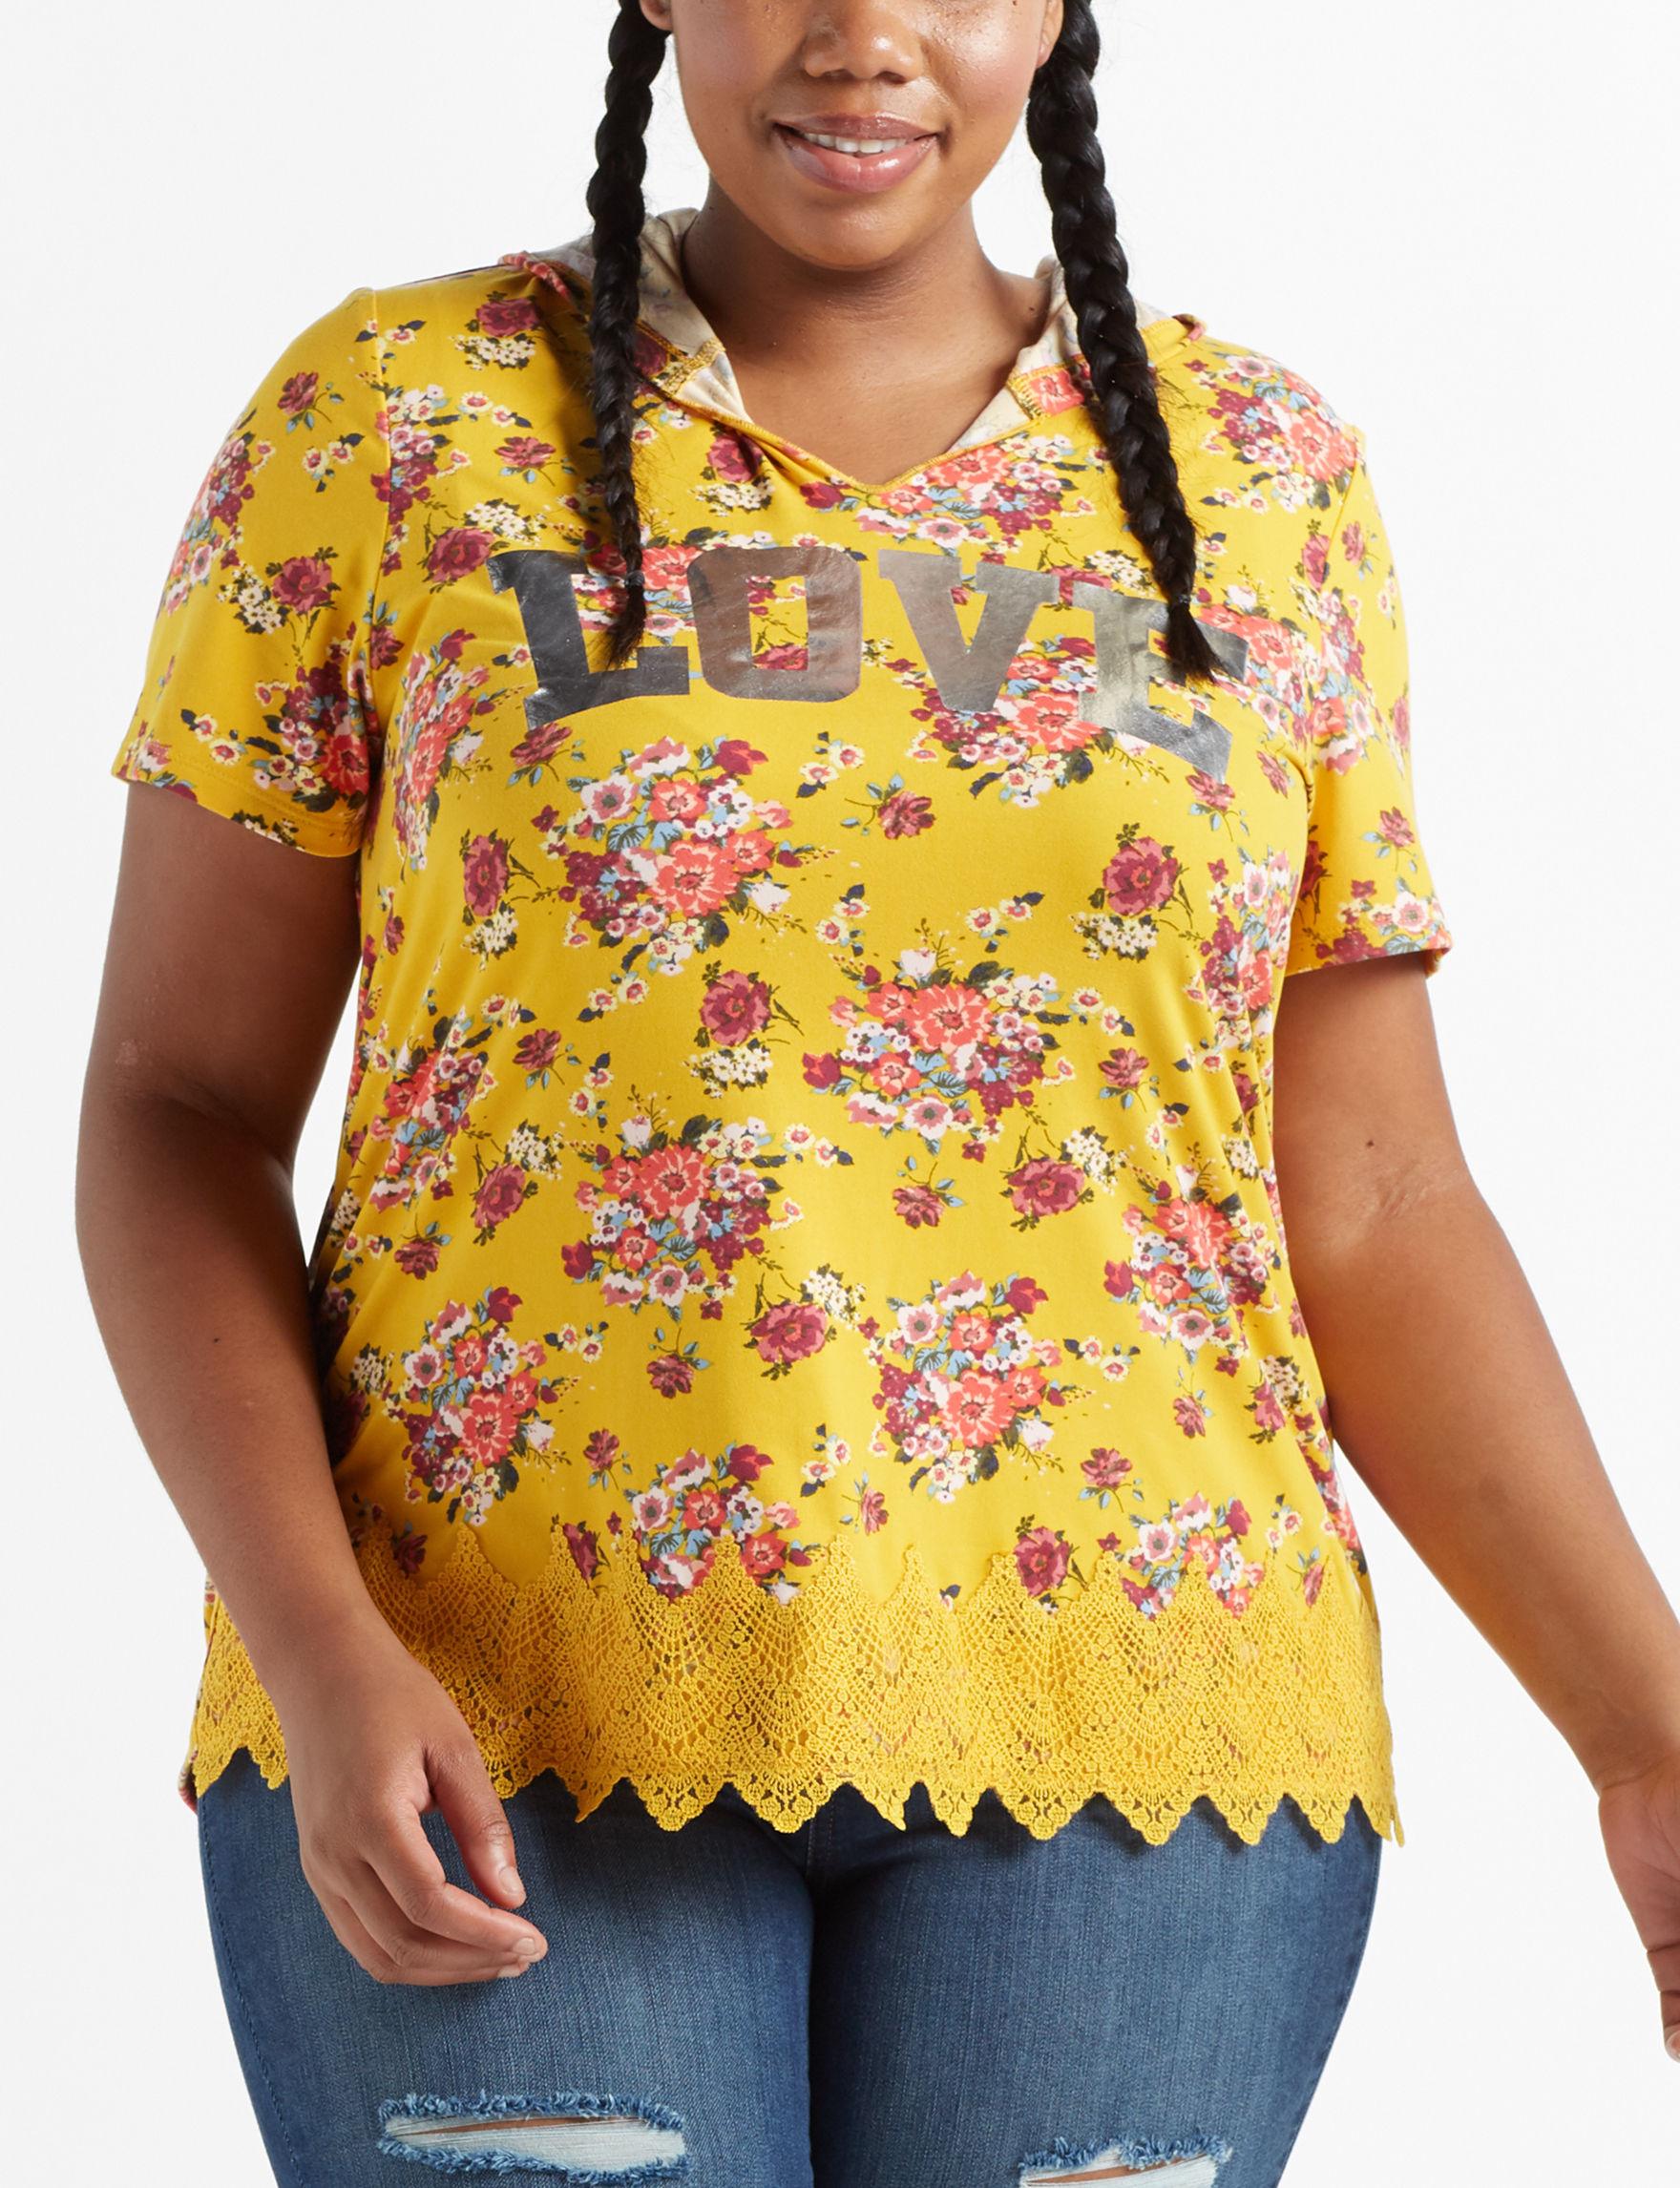 Self Esteem Mustard Shirts & Blouses